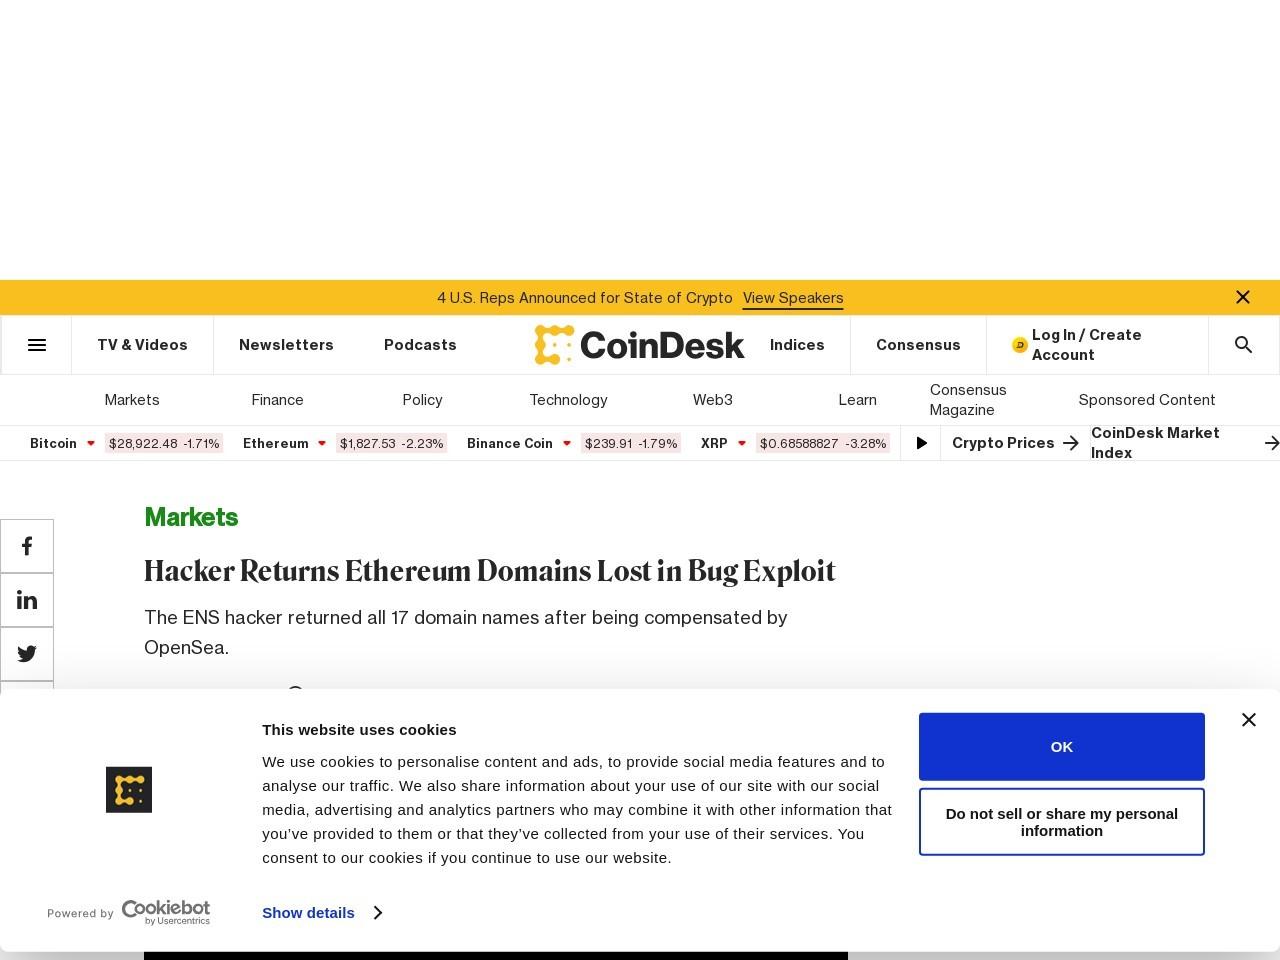 Hacker Returns Ethereum Domains Lost in Bug Exploit